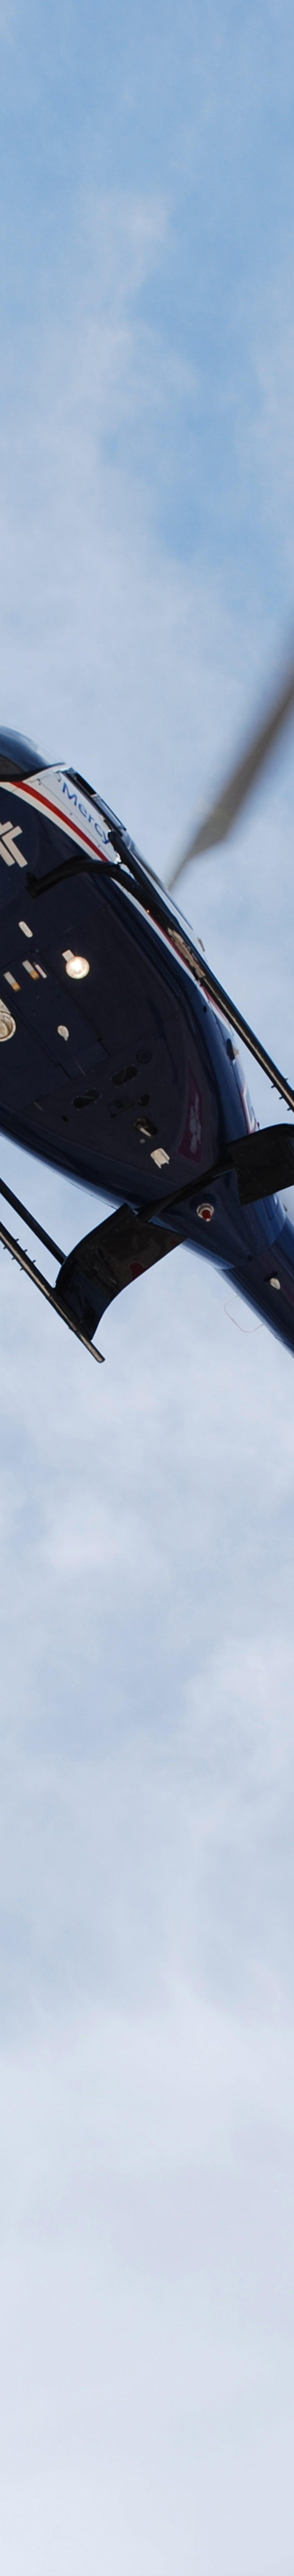 """Spirit of Mercy"" Emergency Medical Helicopter Takes Flight"